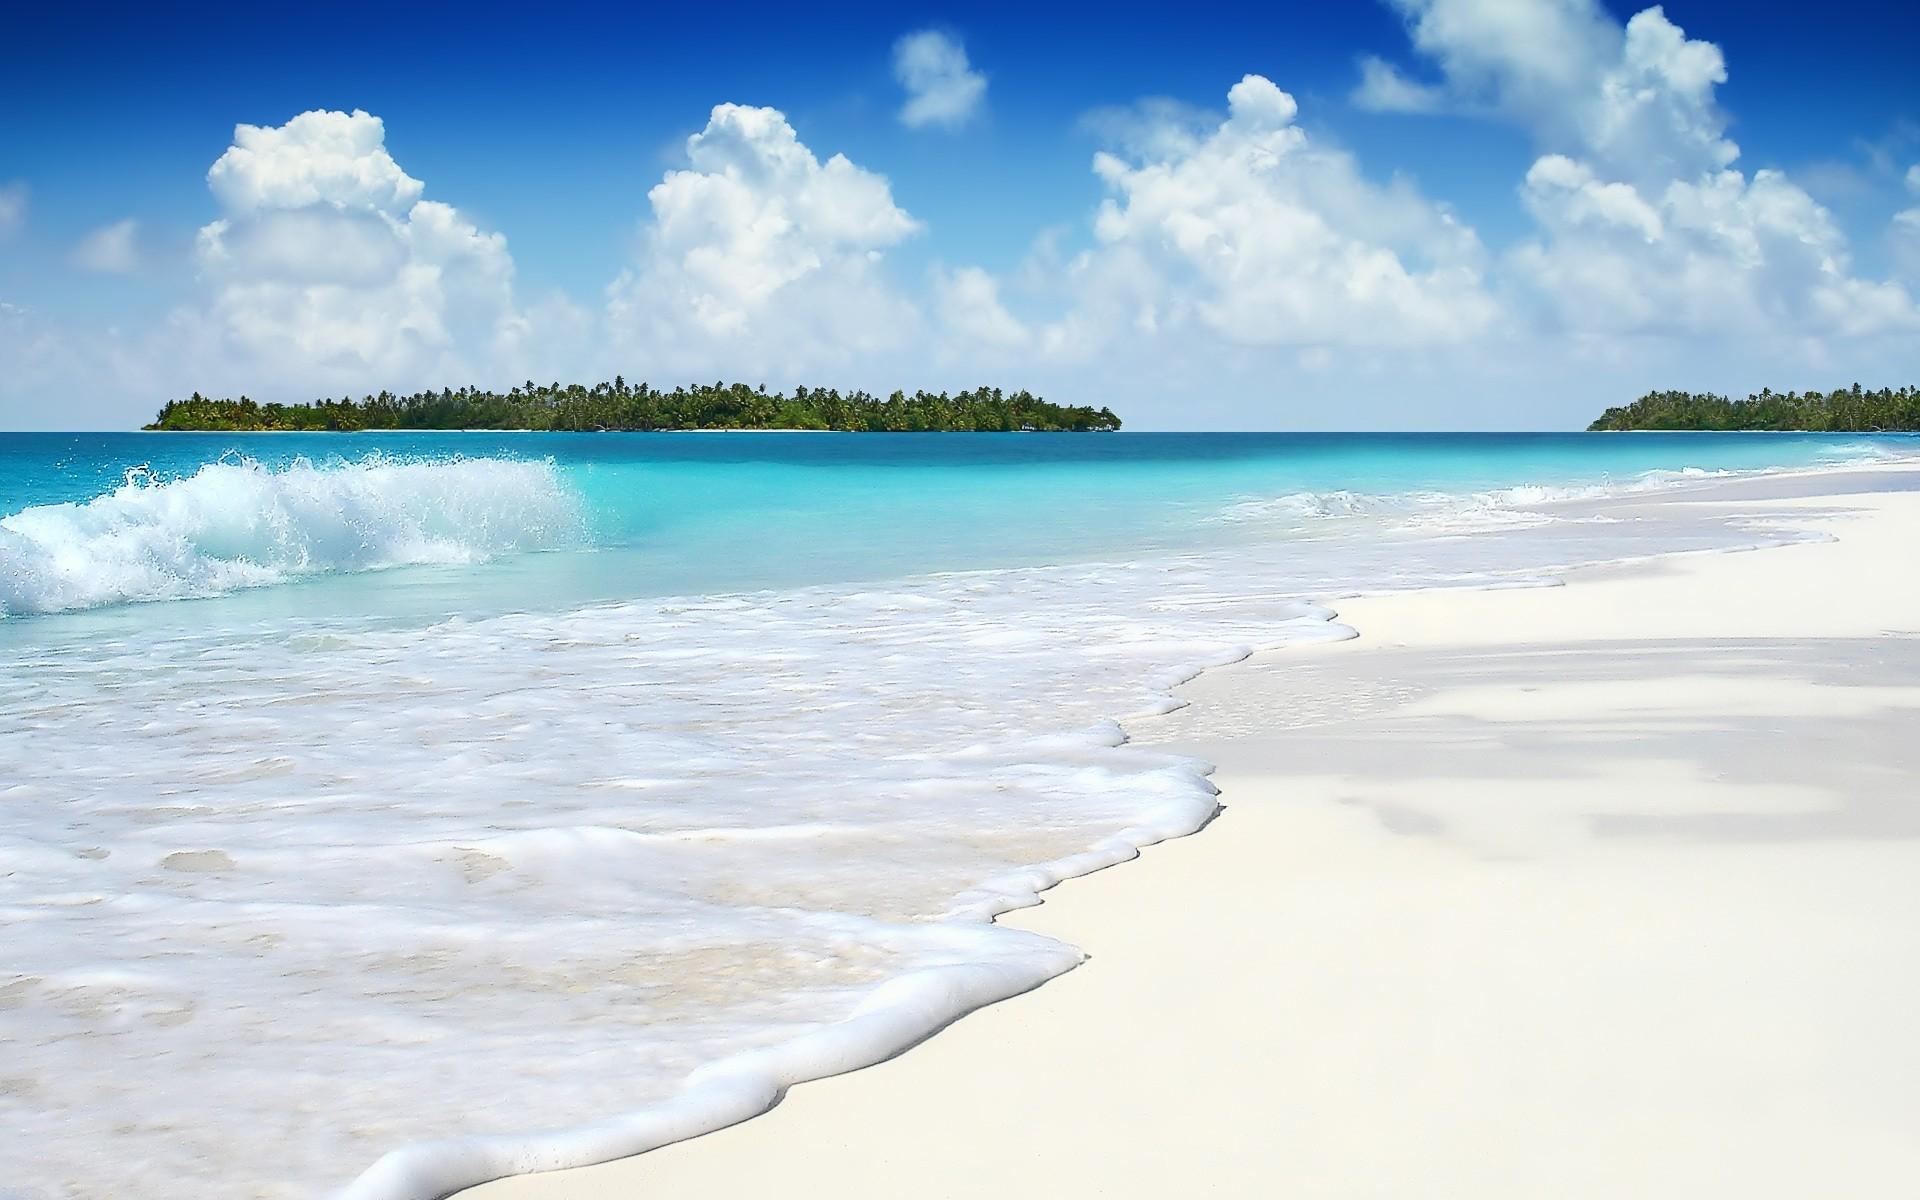 Hermosa playa - 1920x1200